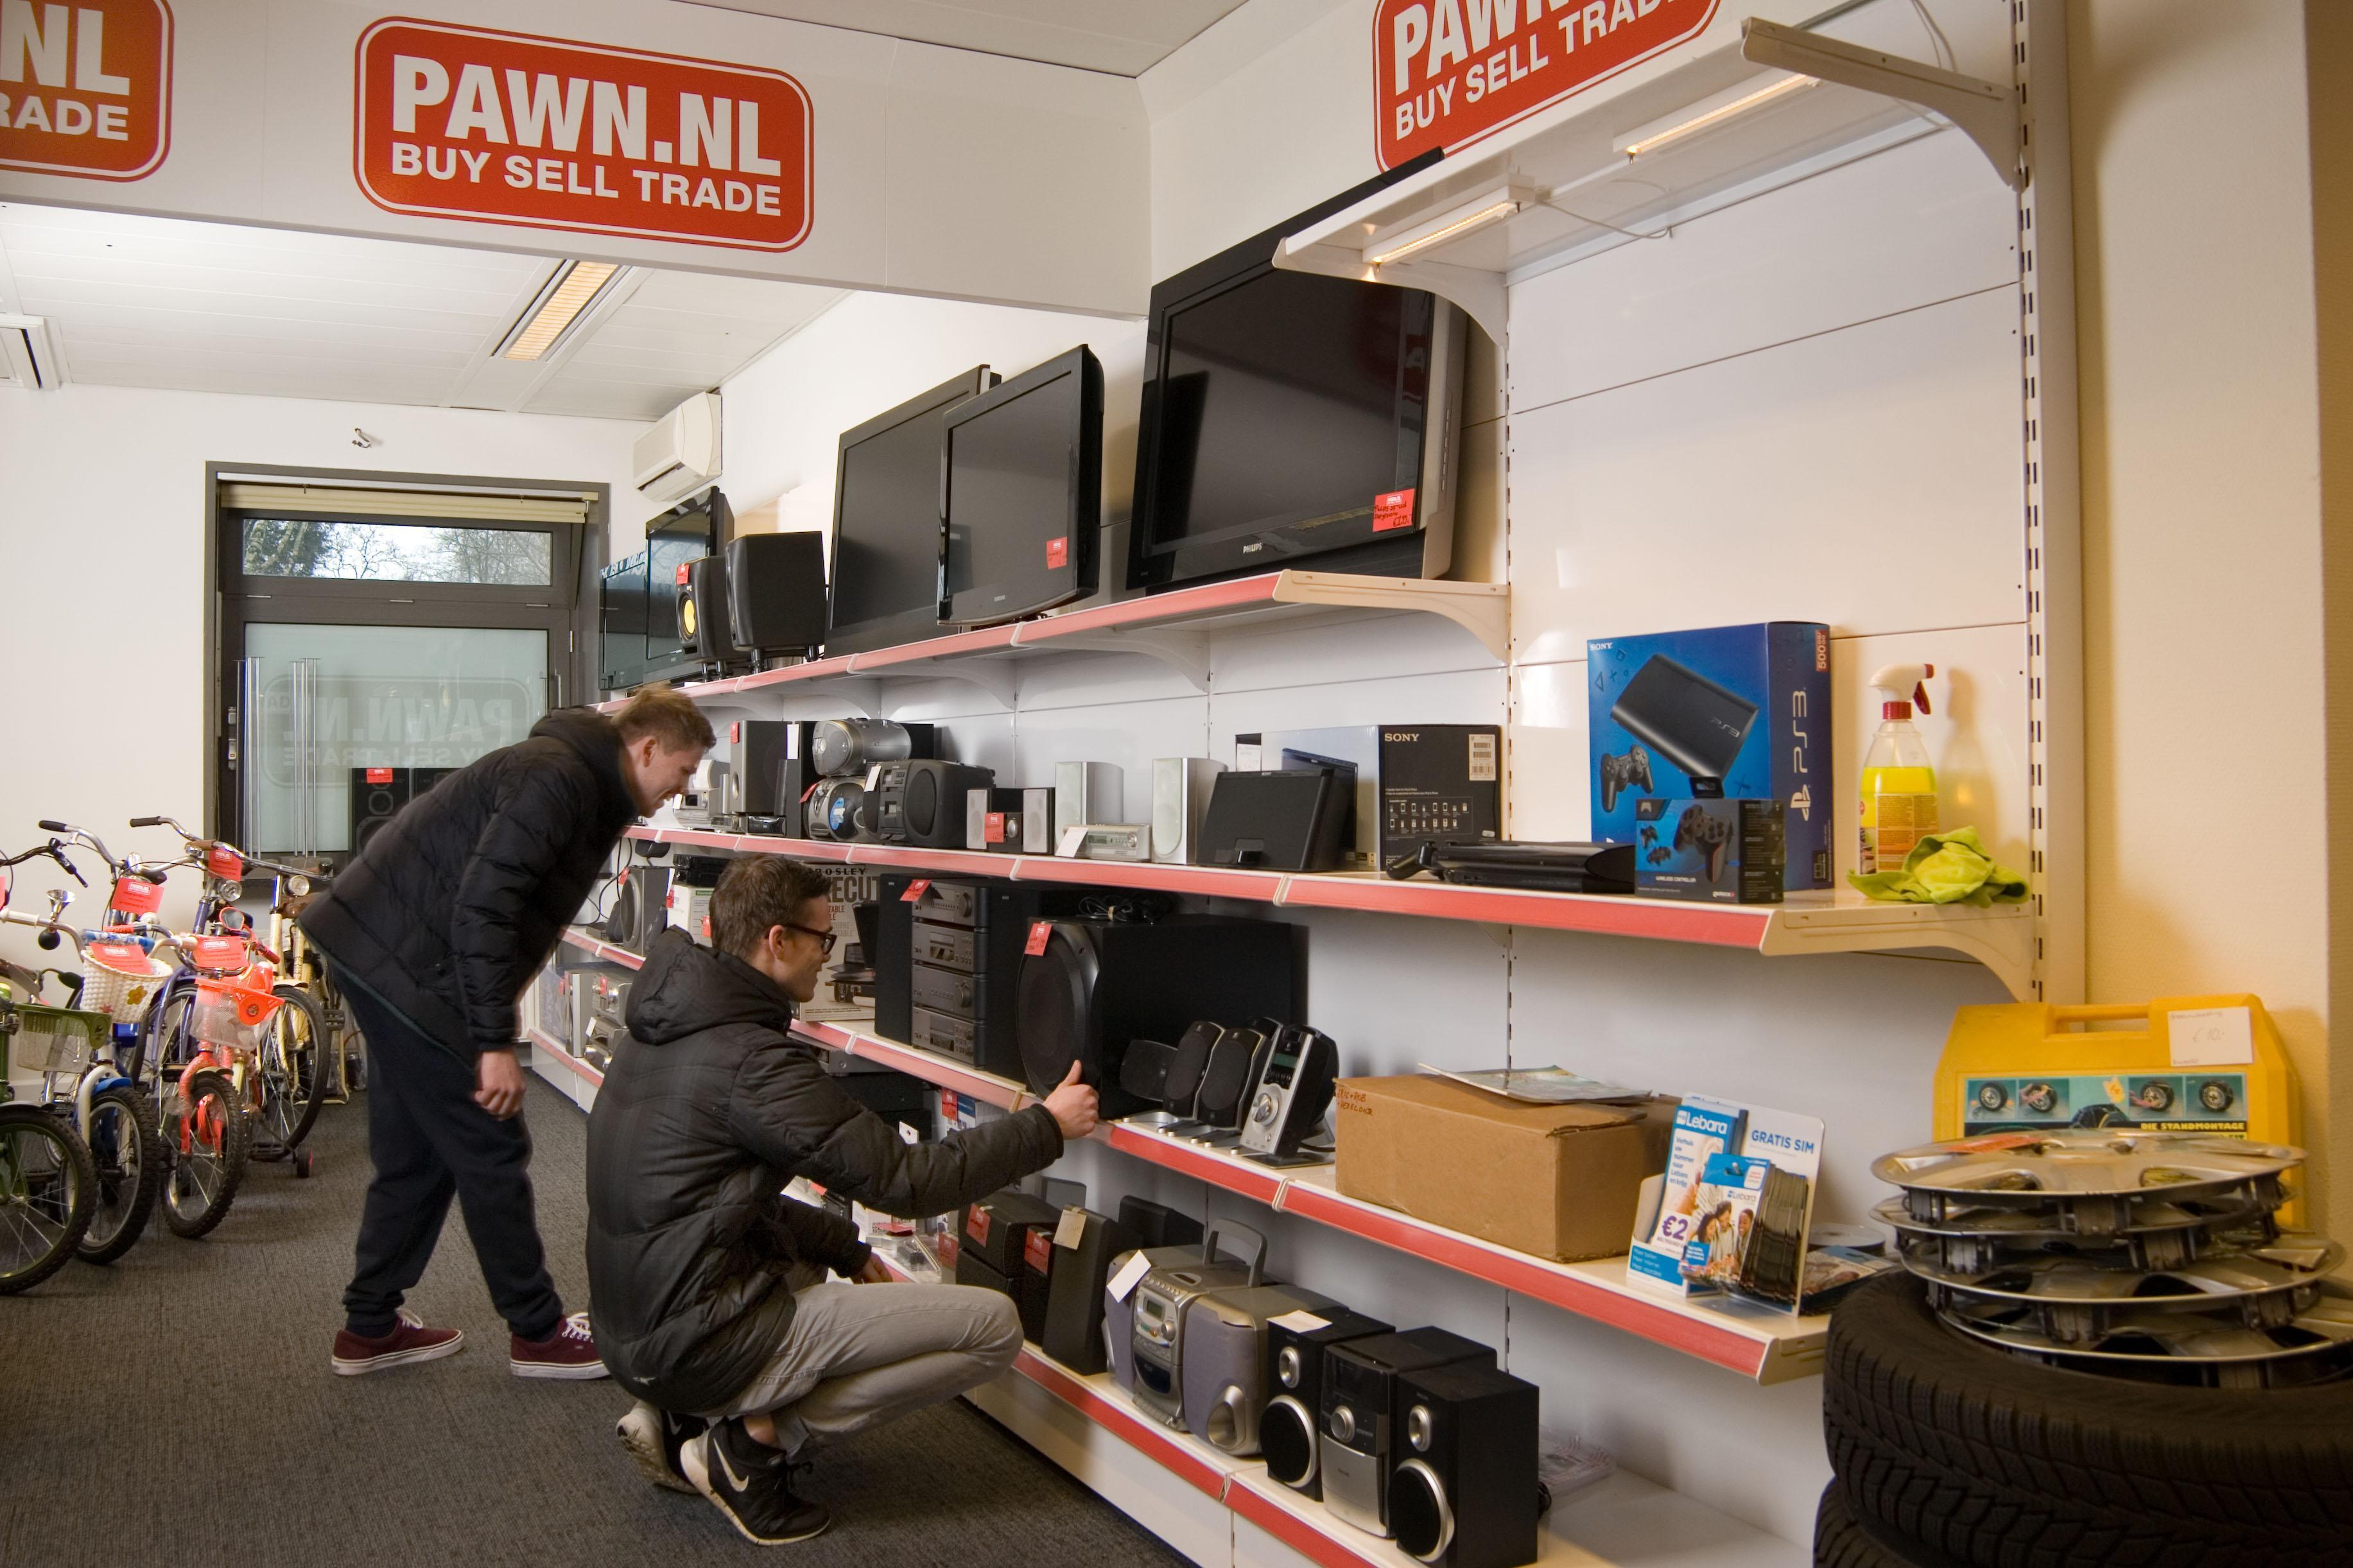 Winkelen bij Pawn.nl